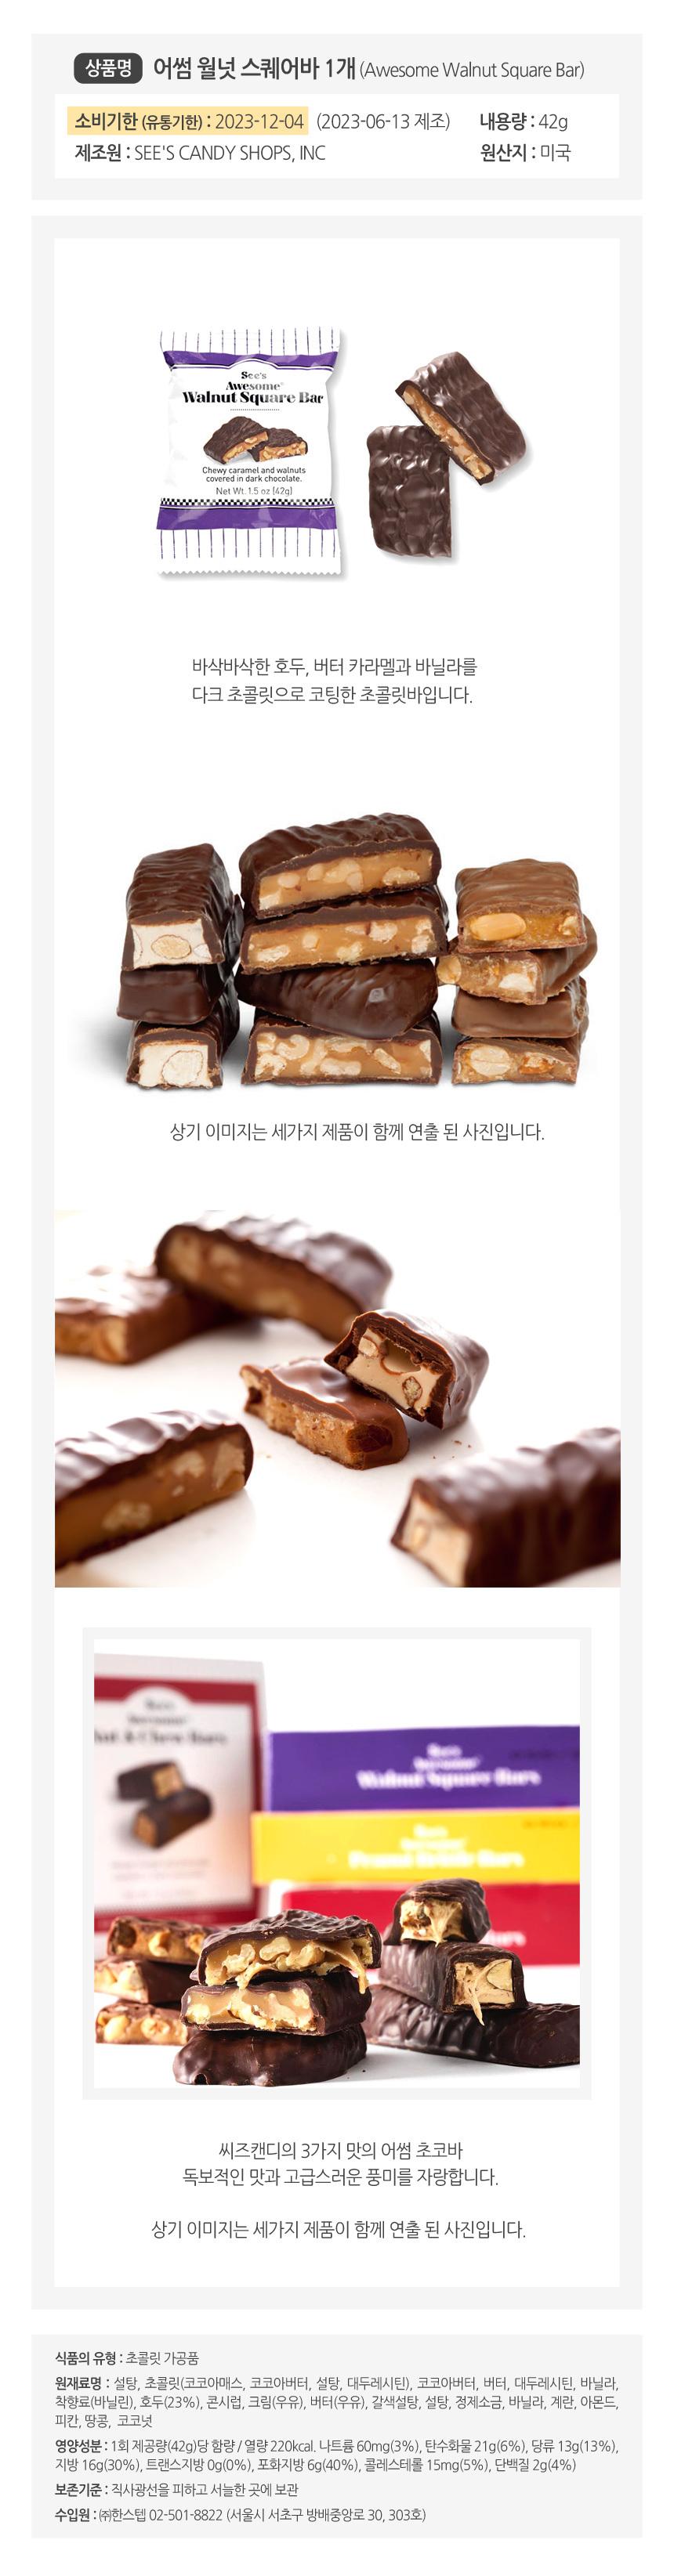 awesome_walnut_square_bar_1.jpg